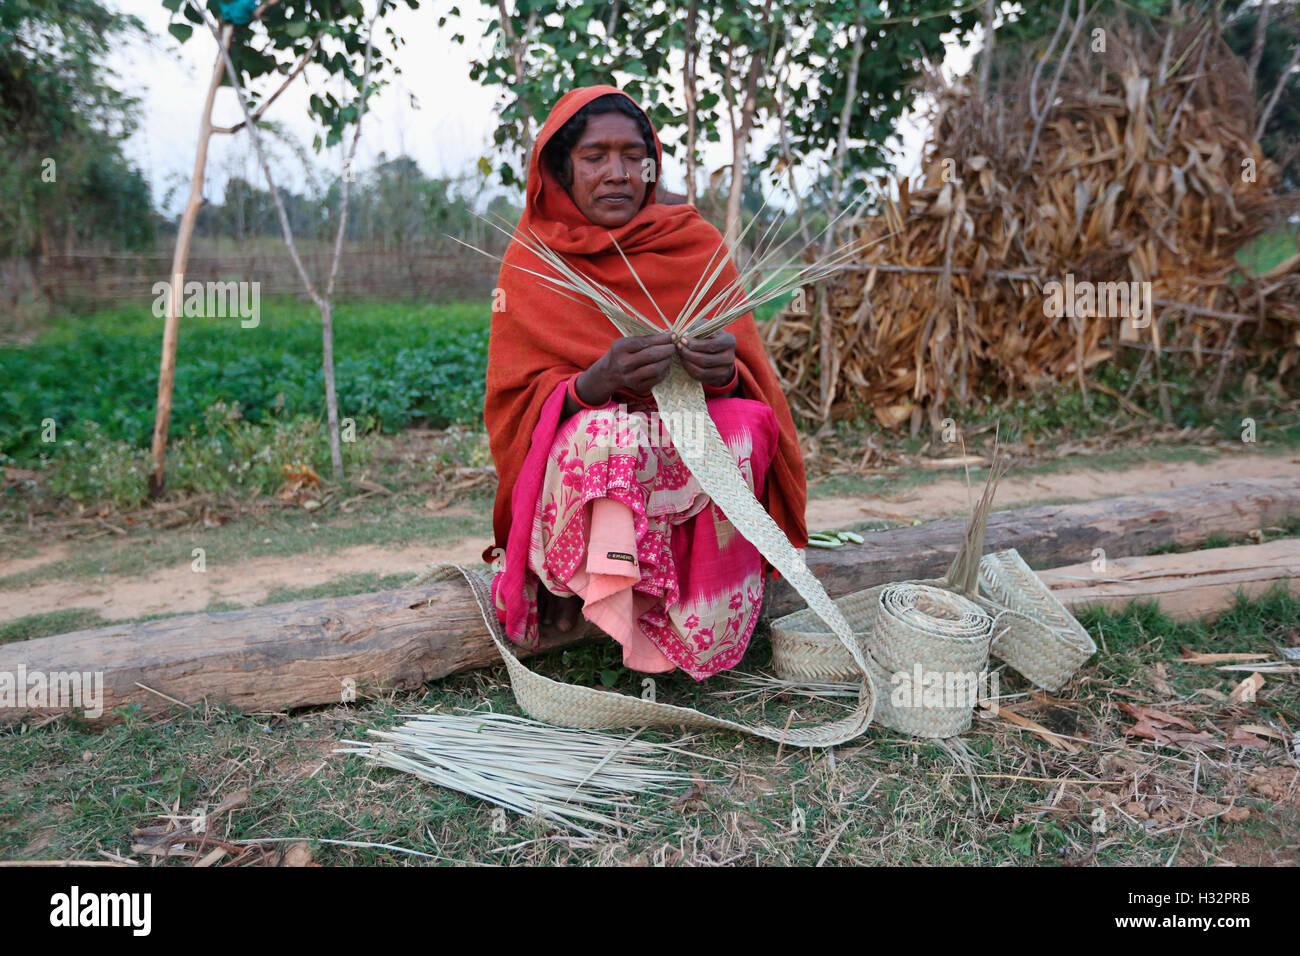 Tribal Woman making mat, KHAIRWAR TRIBE, Chiniya village, Dist Balrampur, Chattisgarh, India - Stock Image